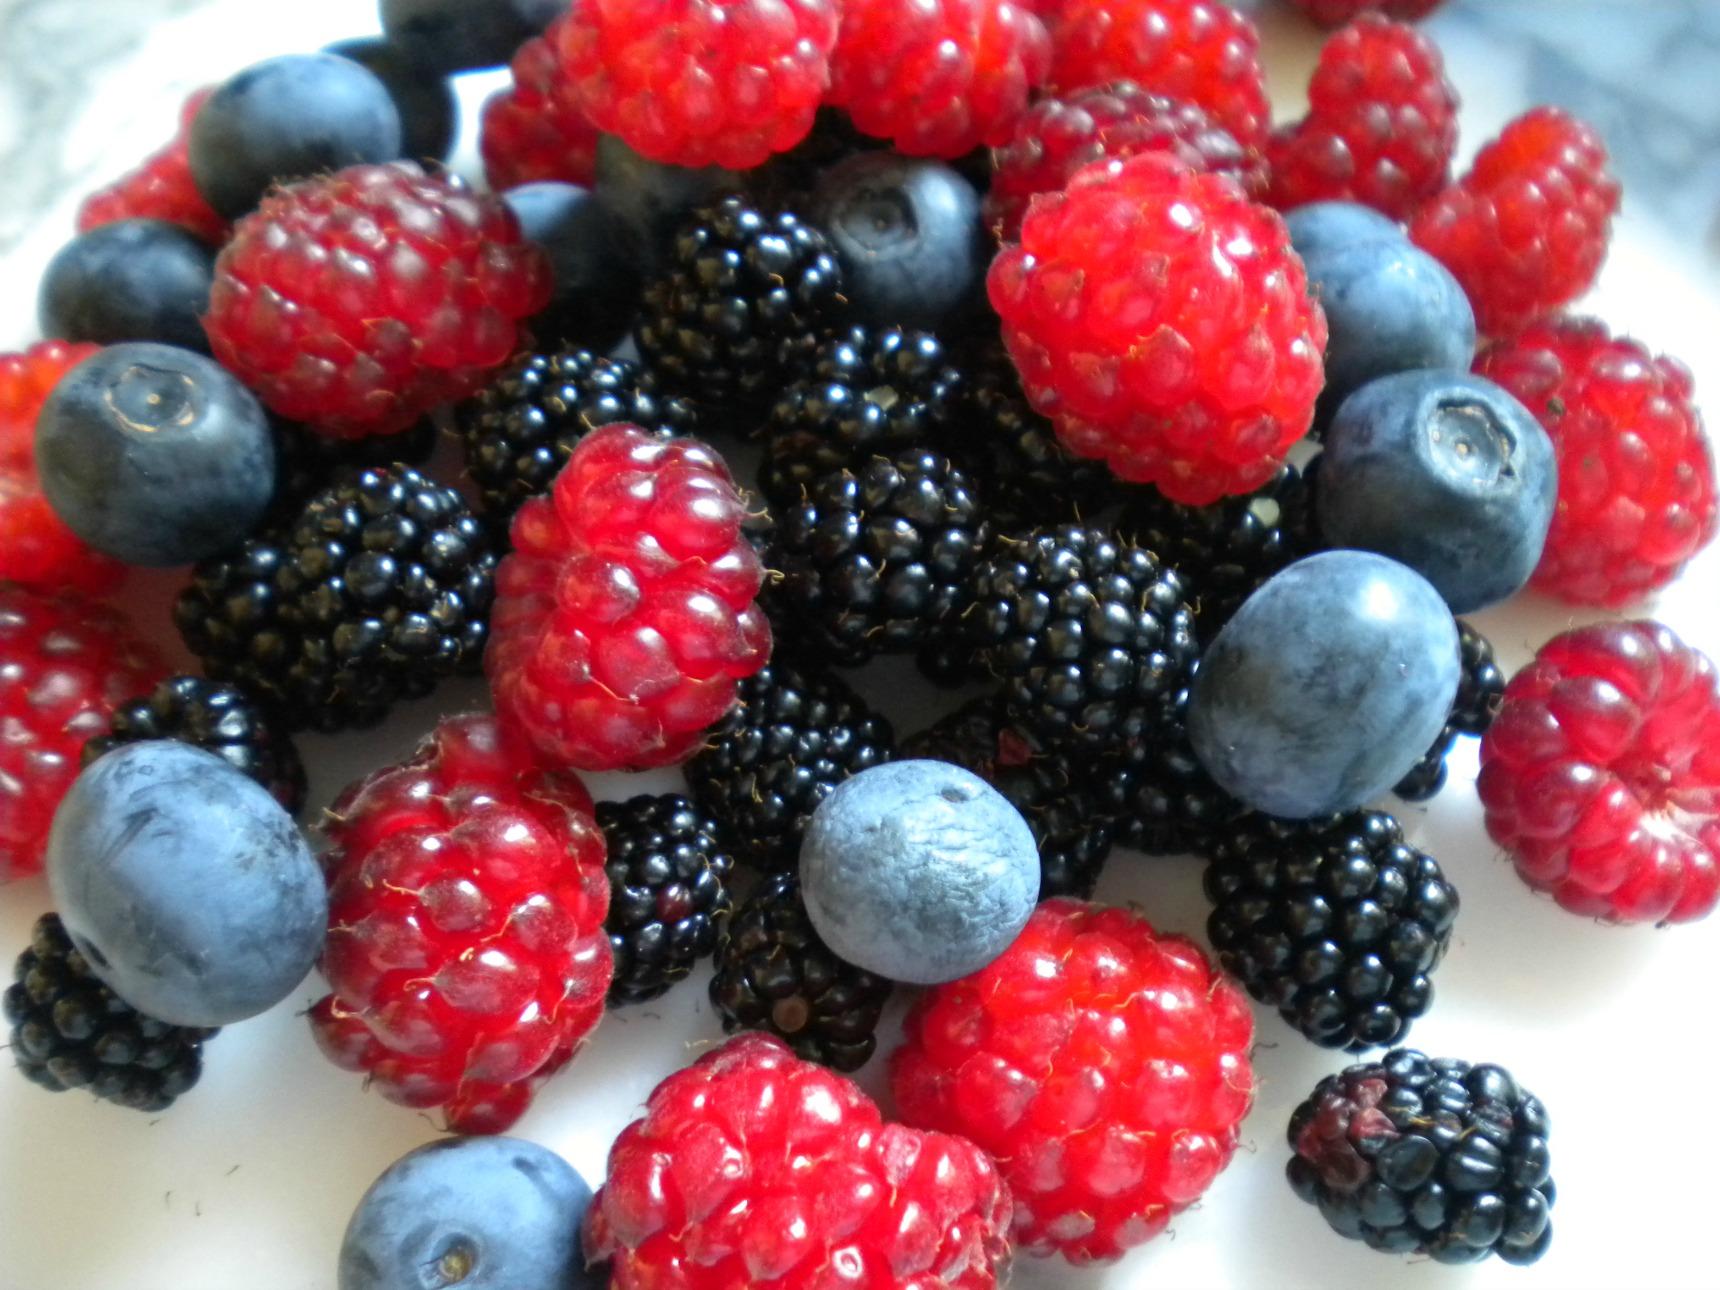 antioxidant berries which berries